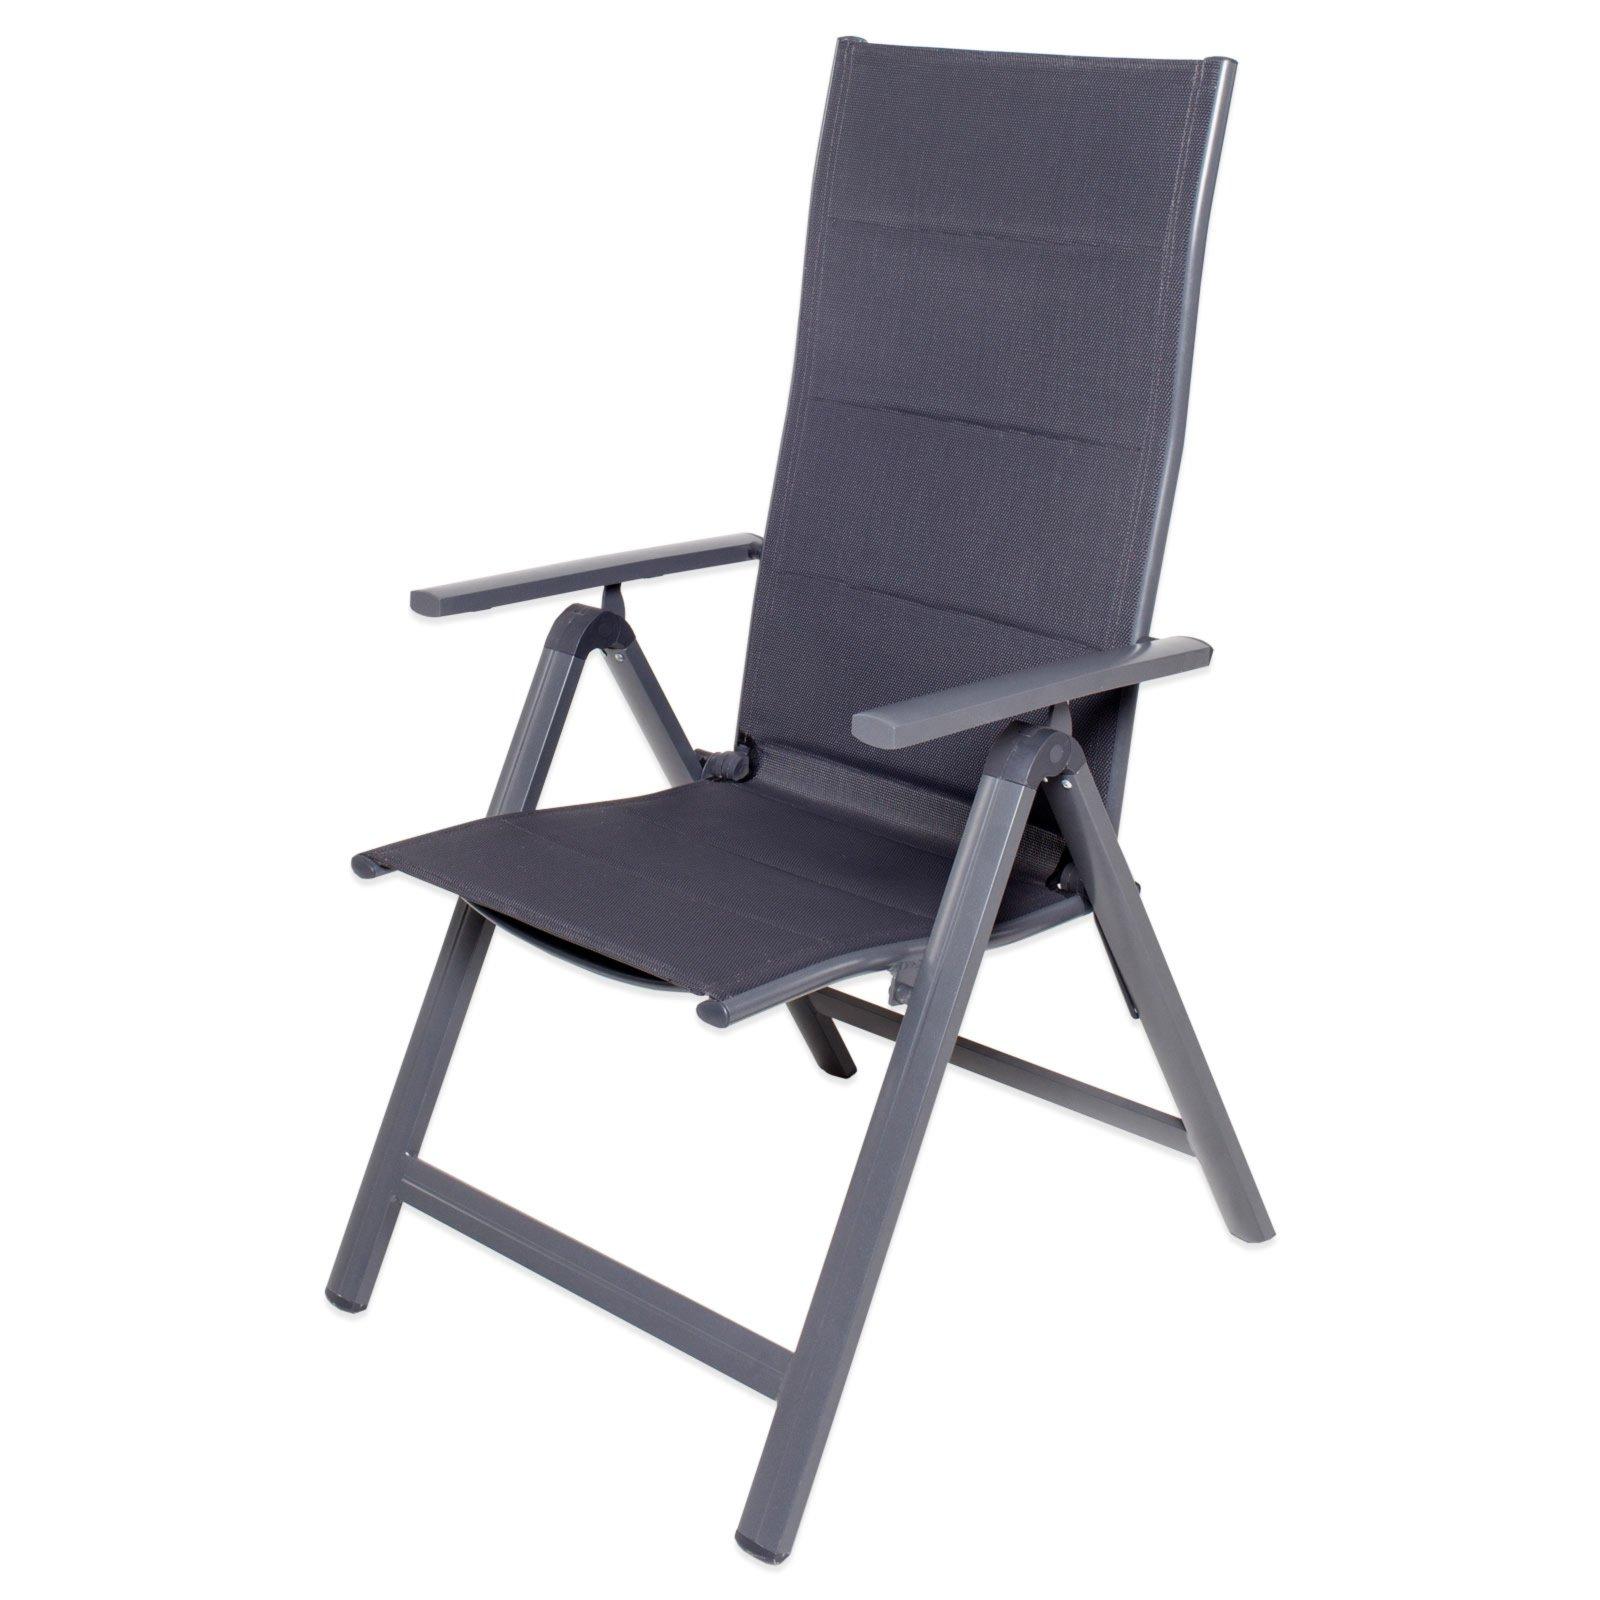 gartenstuhl anthrazit klappbar gartenst hle gartenm bel garten roller. Black Bedroom Furniture Sets. Home Design Ideas